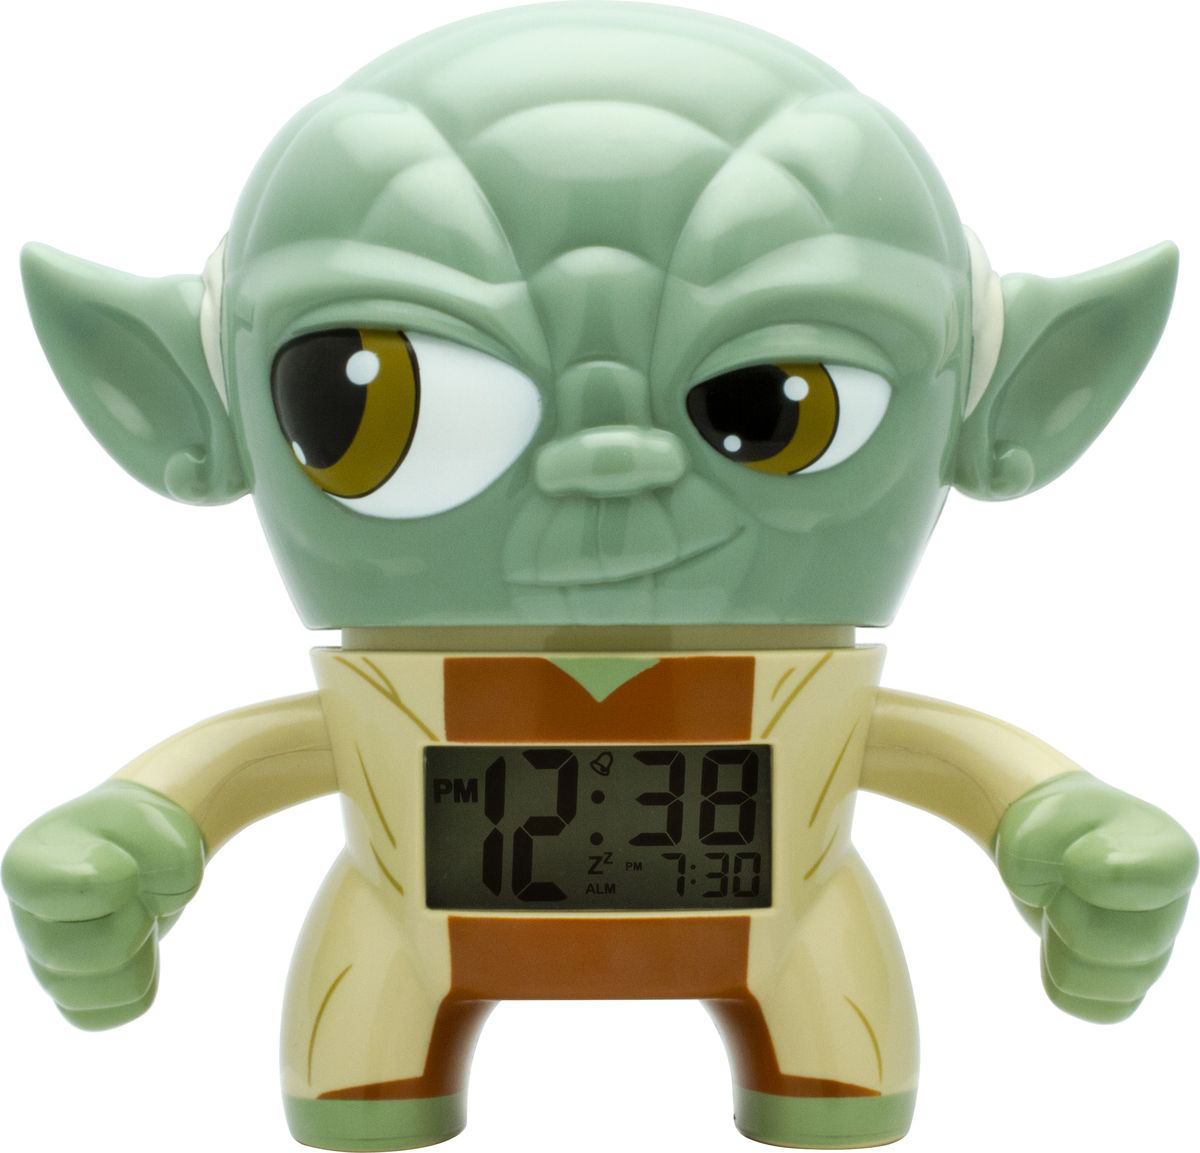 Star Wars BulbBotz Будильник детский Yoda